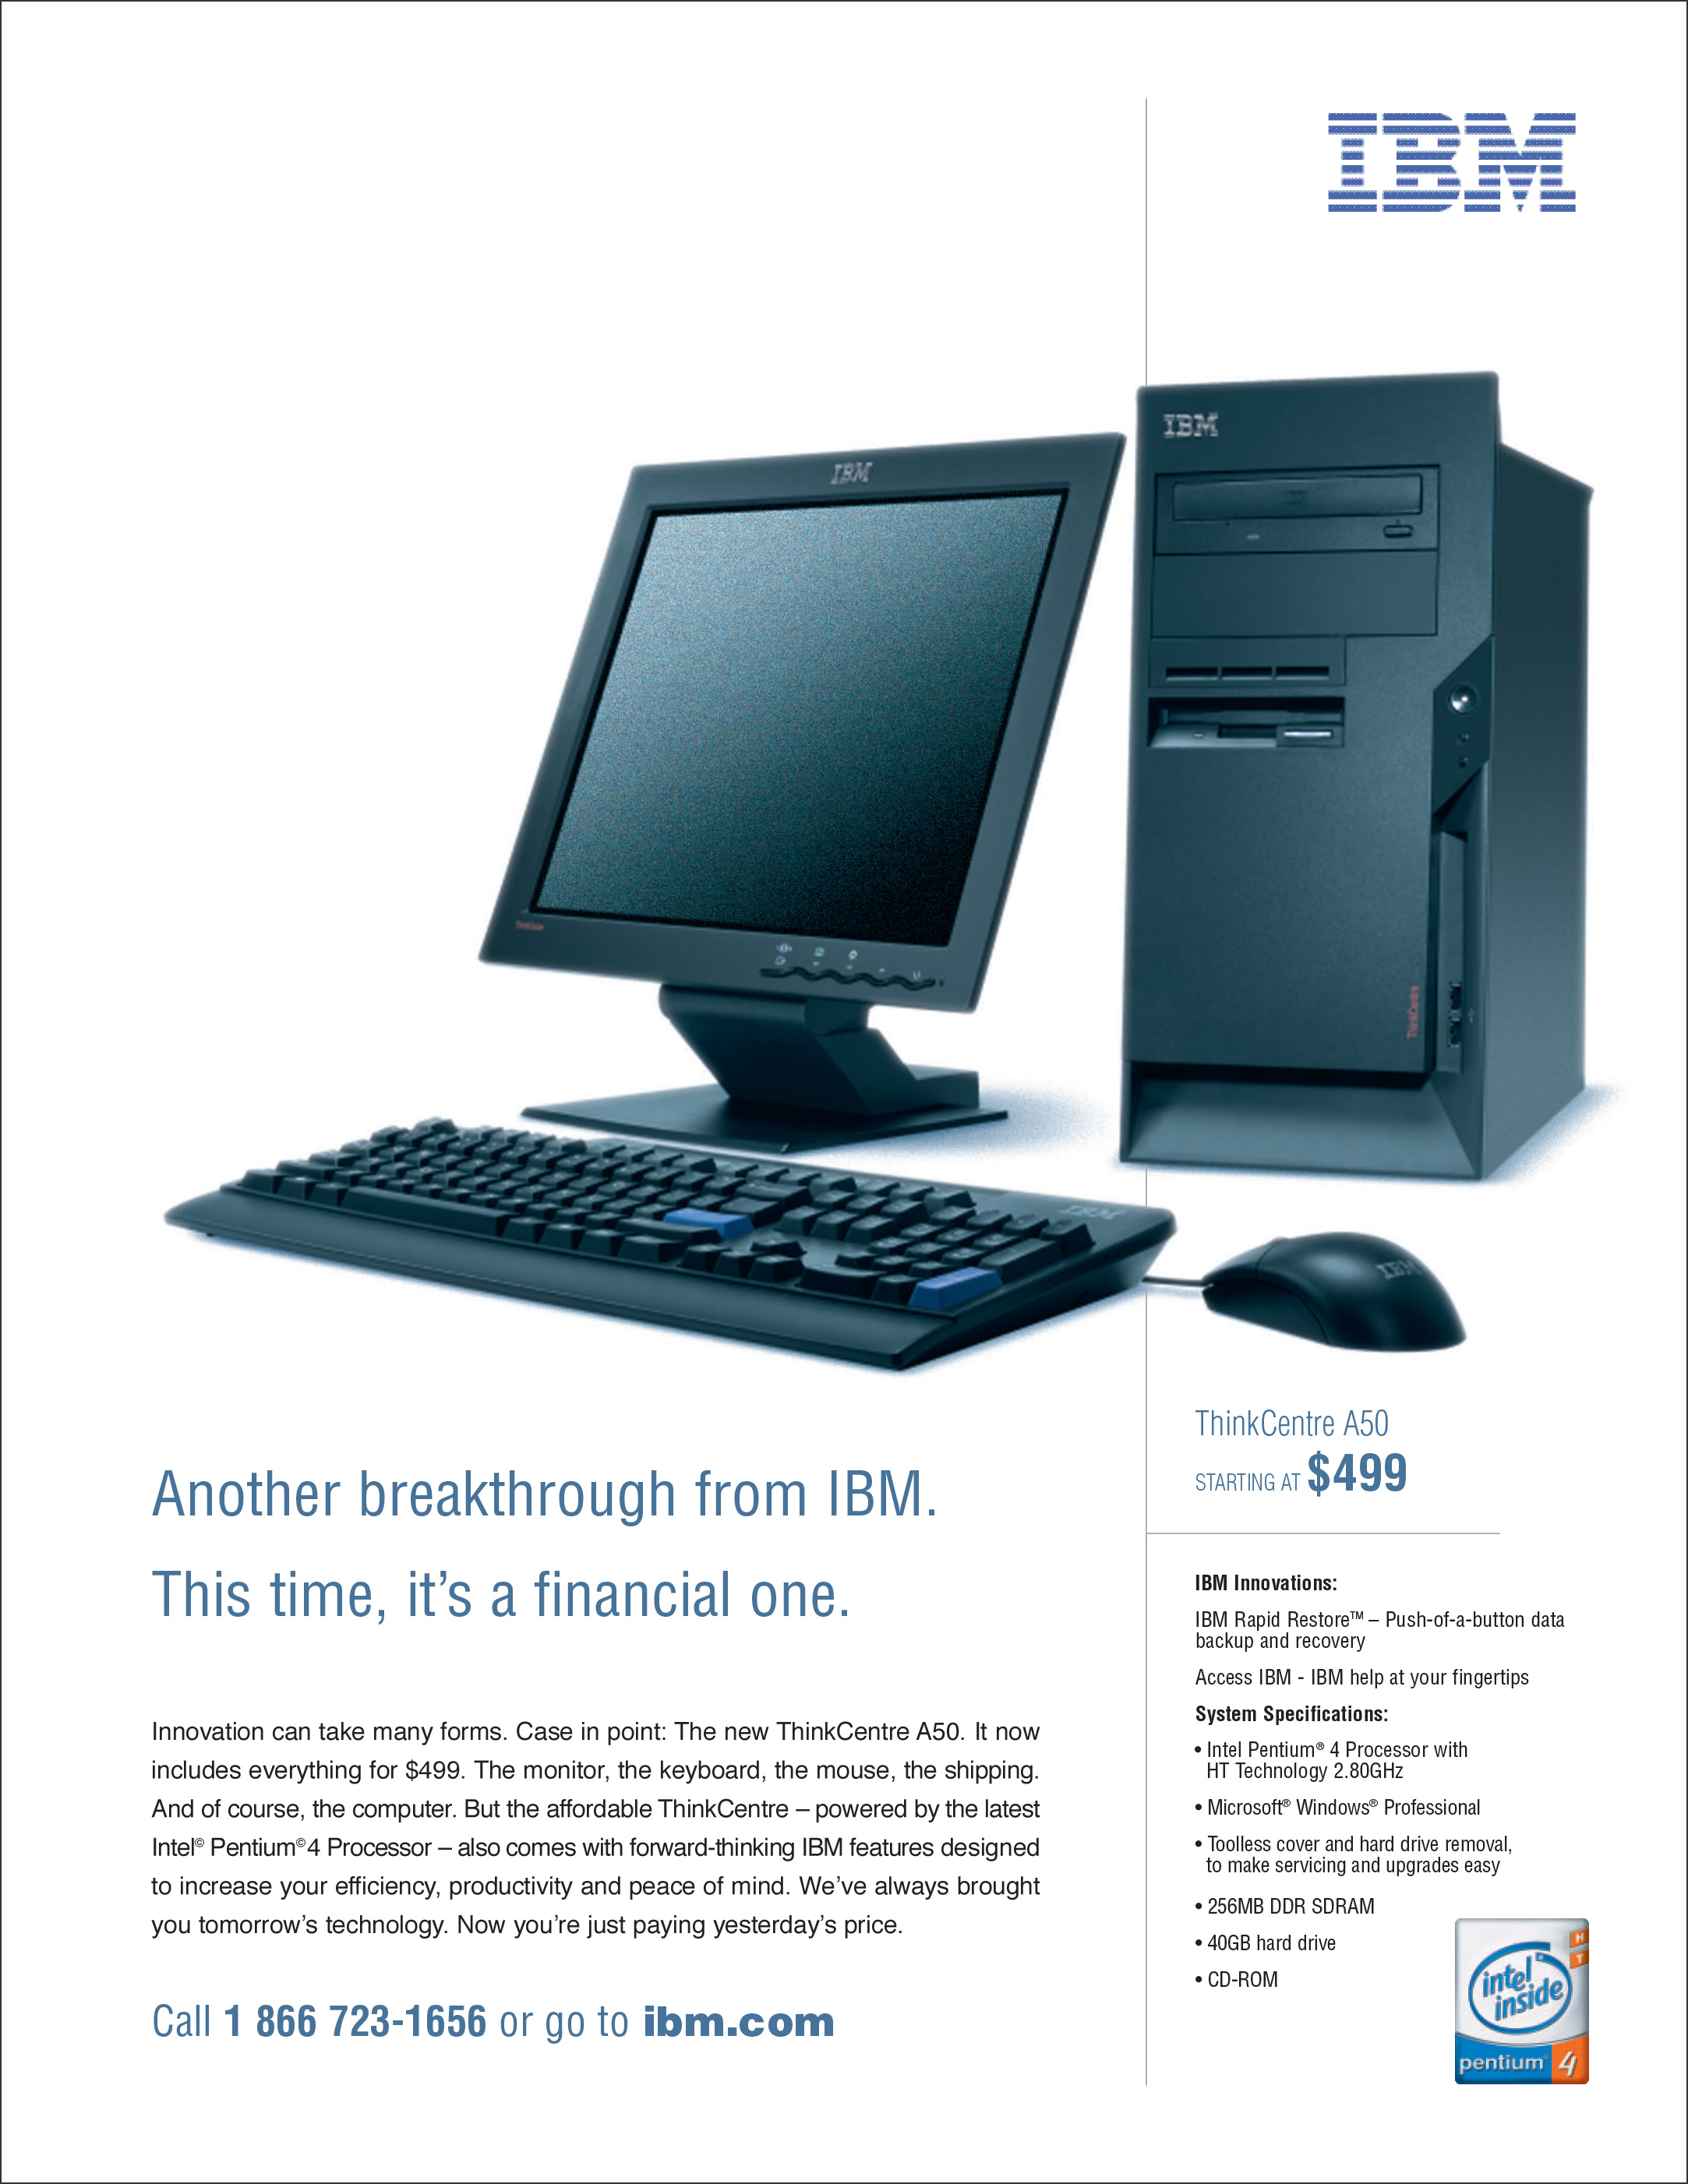 ibm-print-break-through.jpg